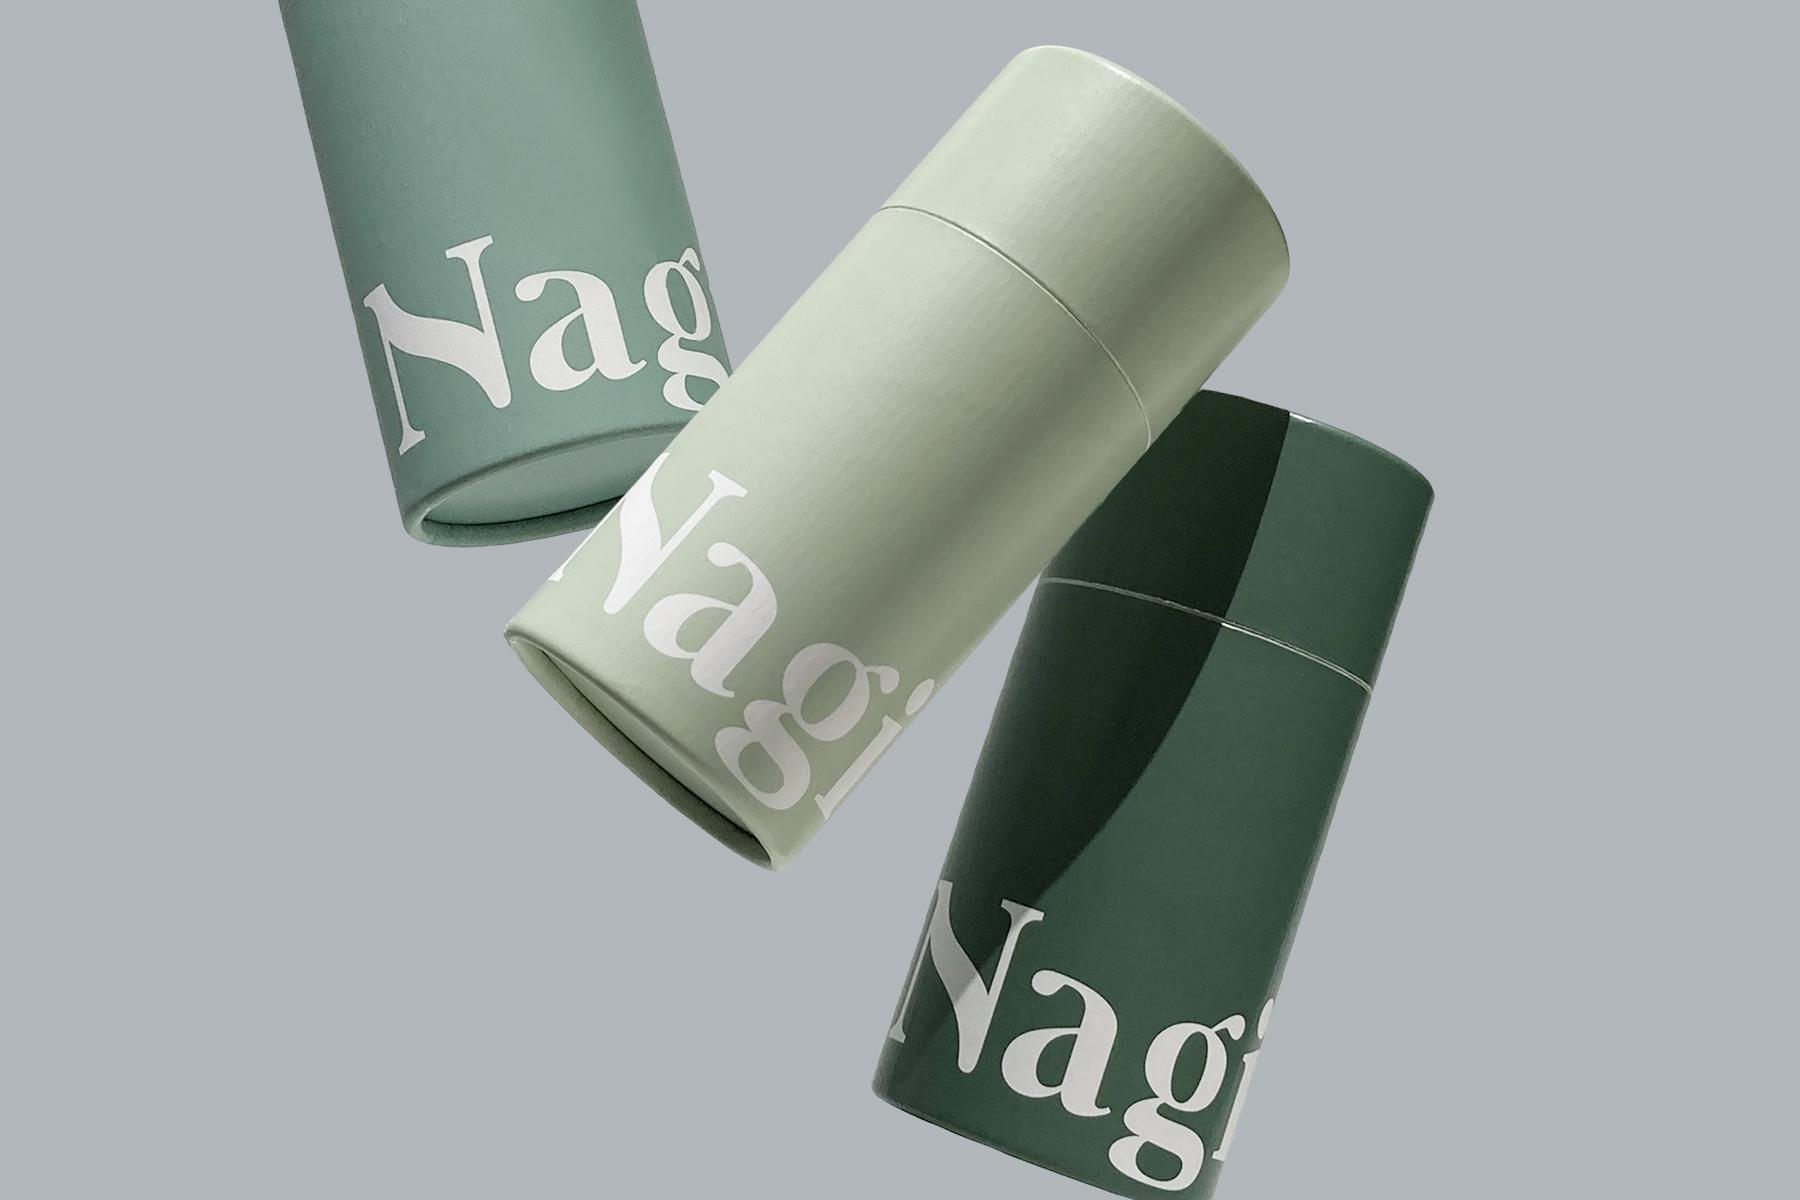 Juri Okita Creates Brand Identity for a Japanese Fem-tech Brand Nagi